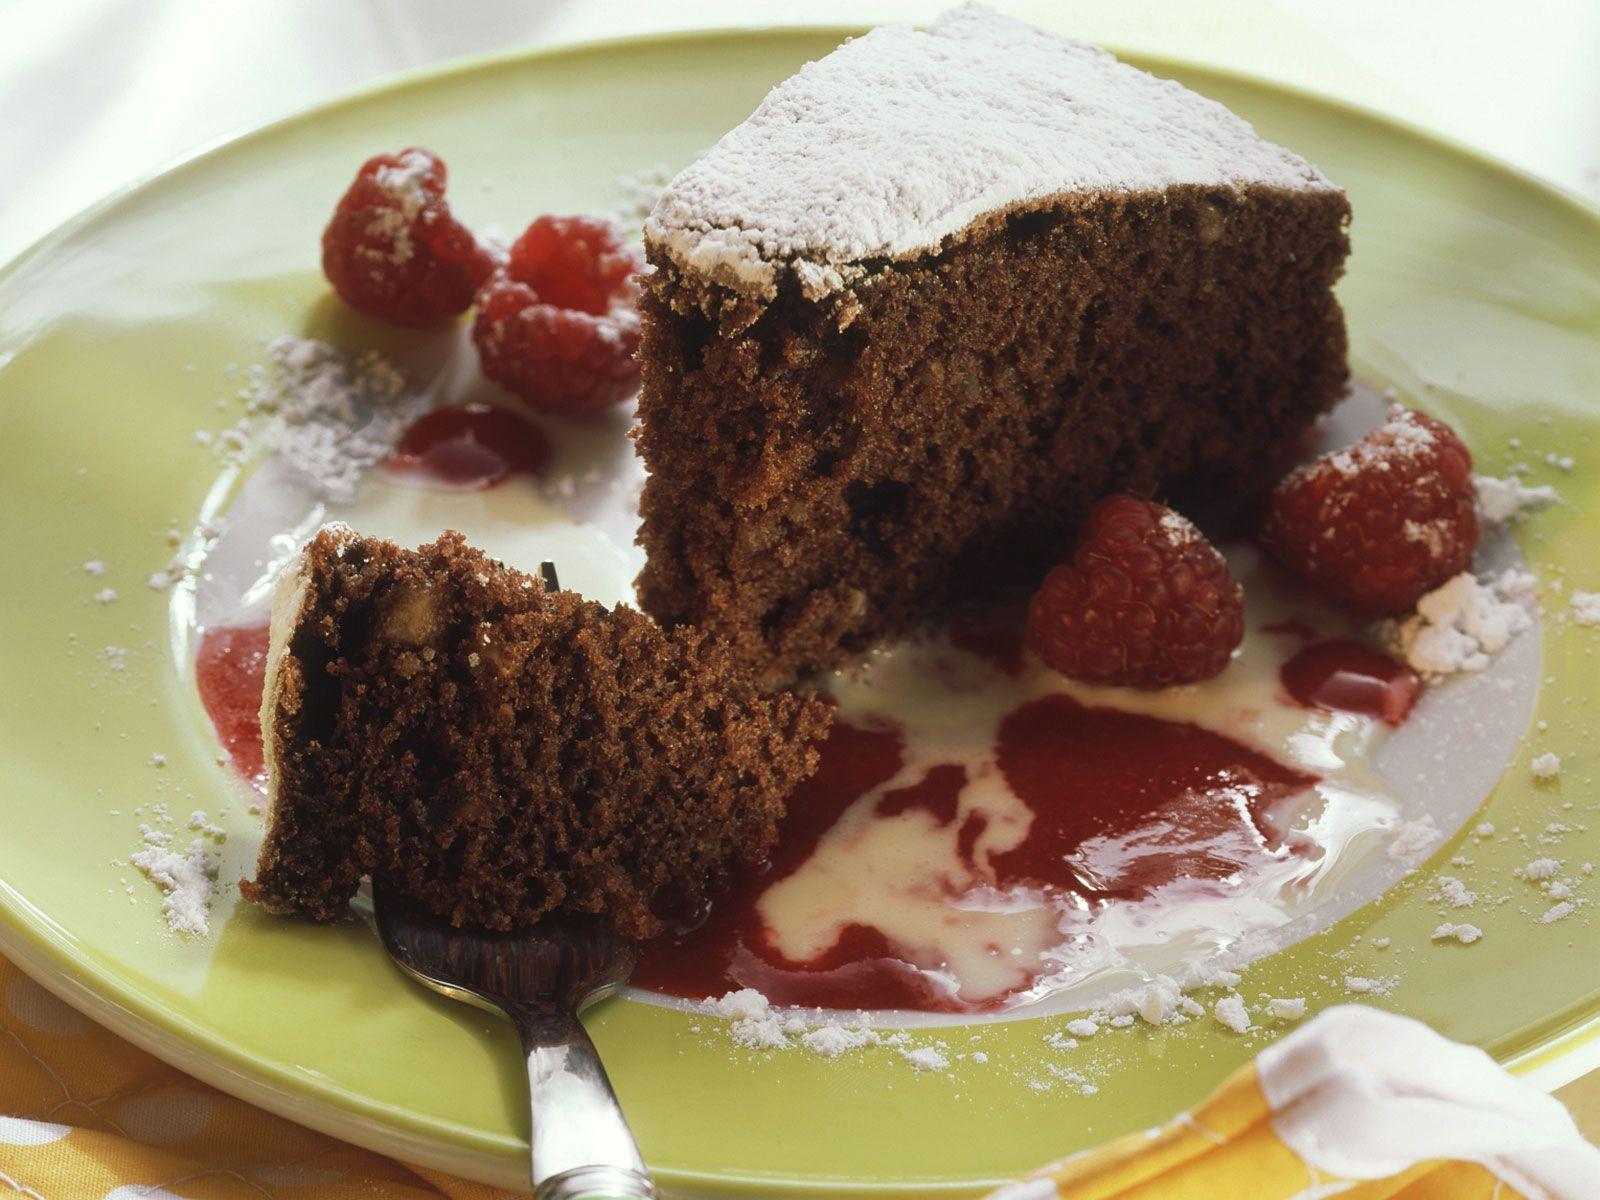 Schokoladen Nuss Kuchen Mit Himbeer Und Vanillesosse Rezept Eat